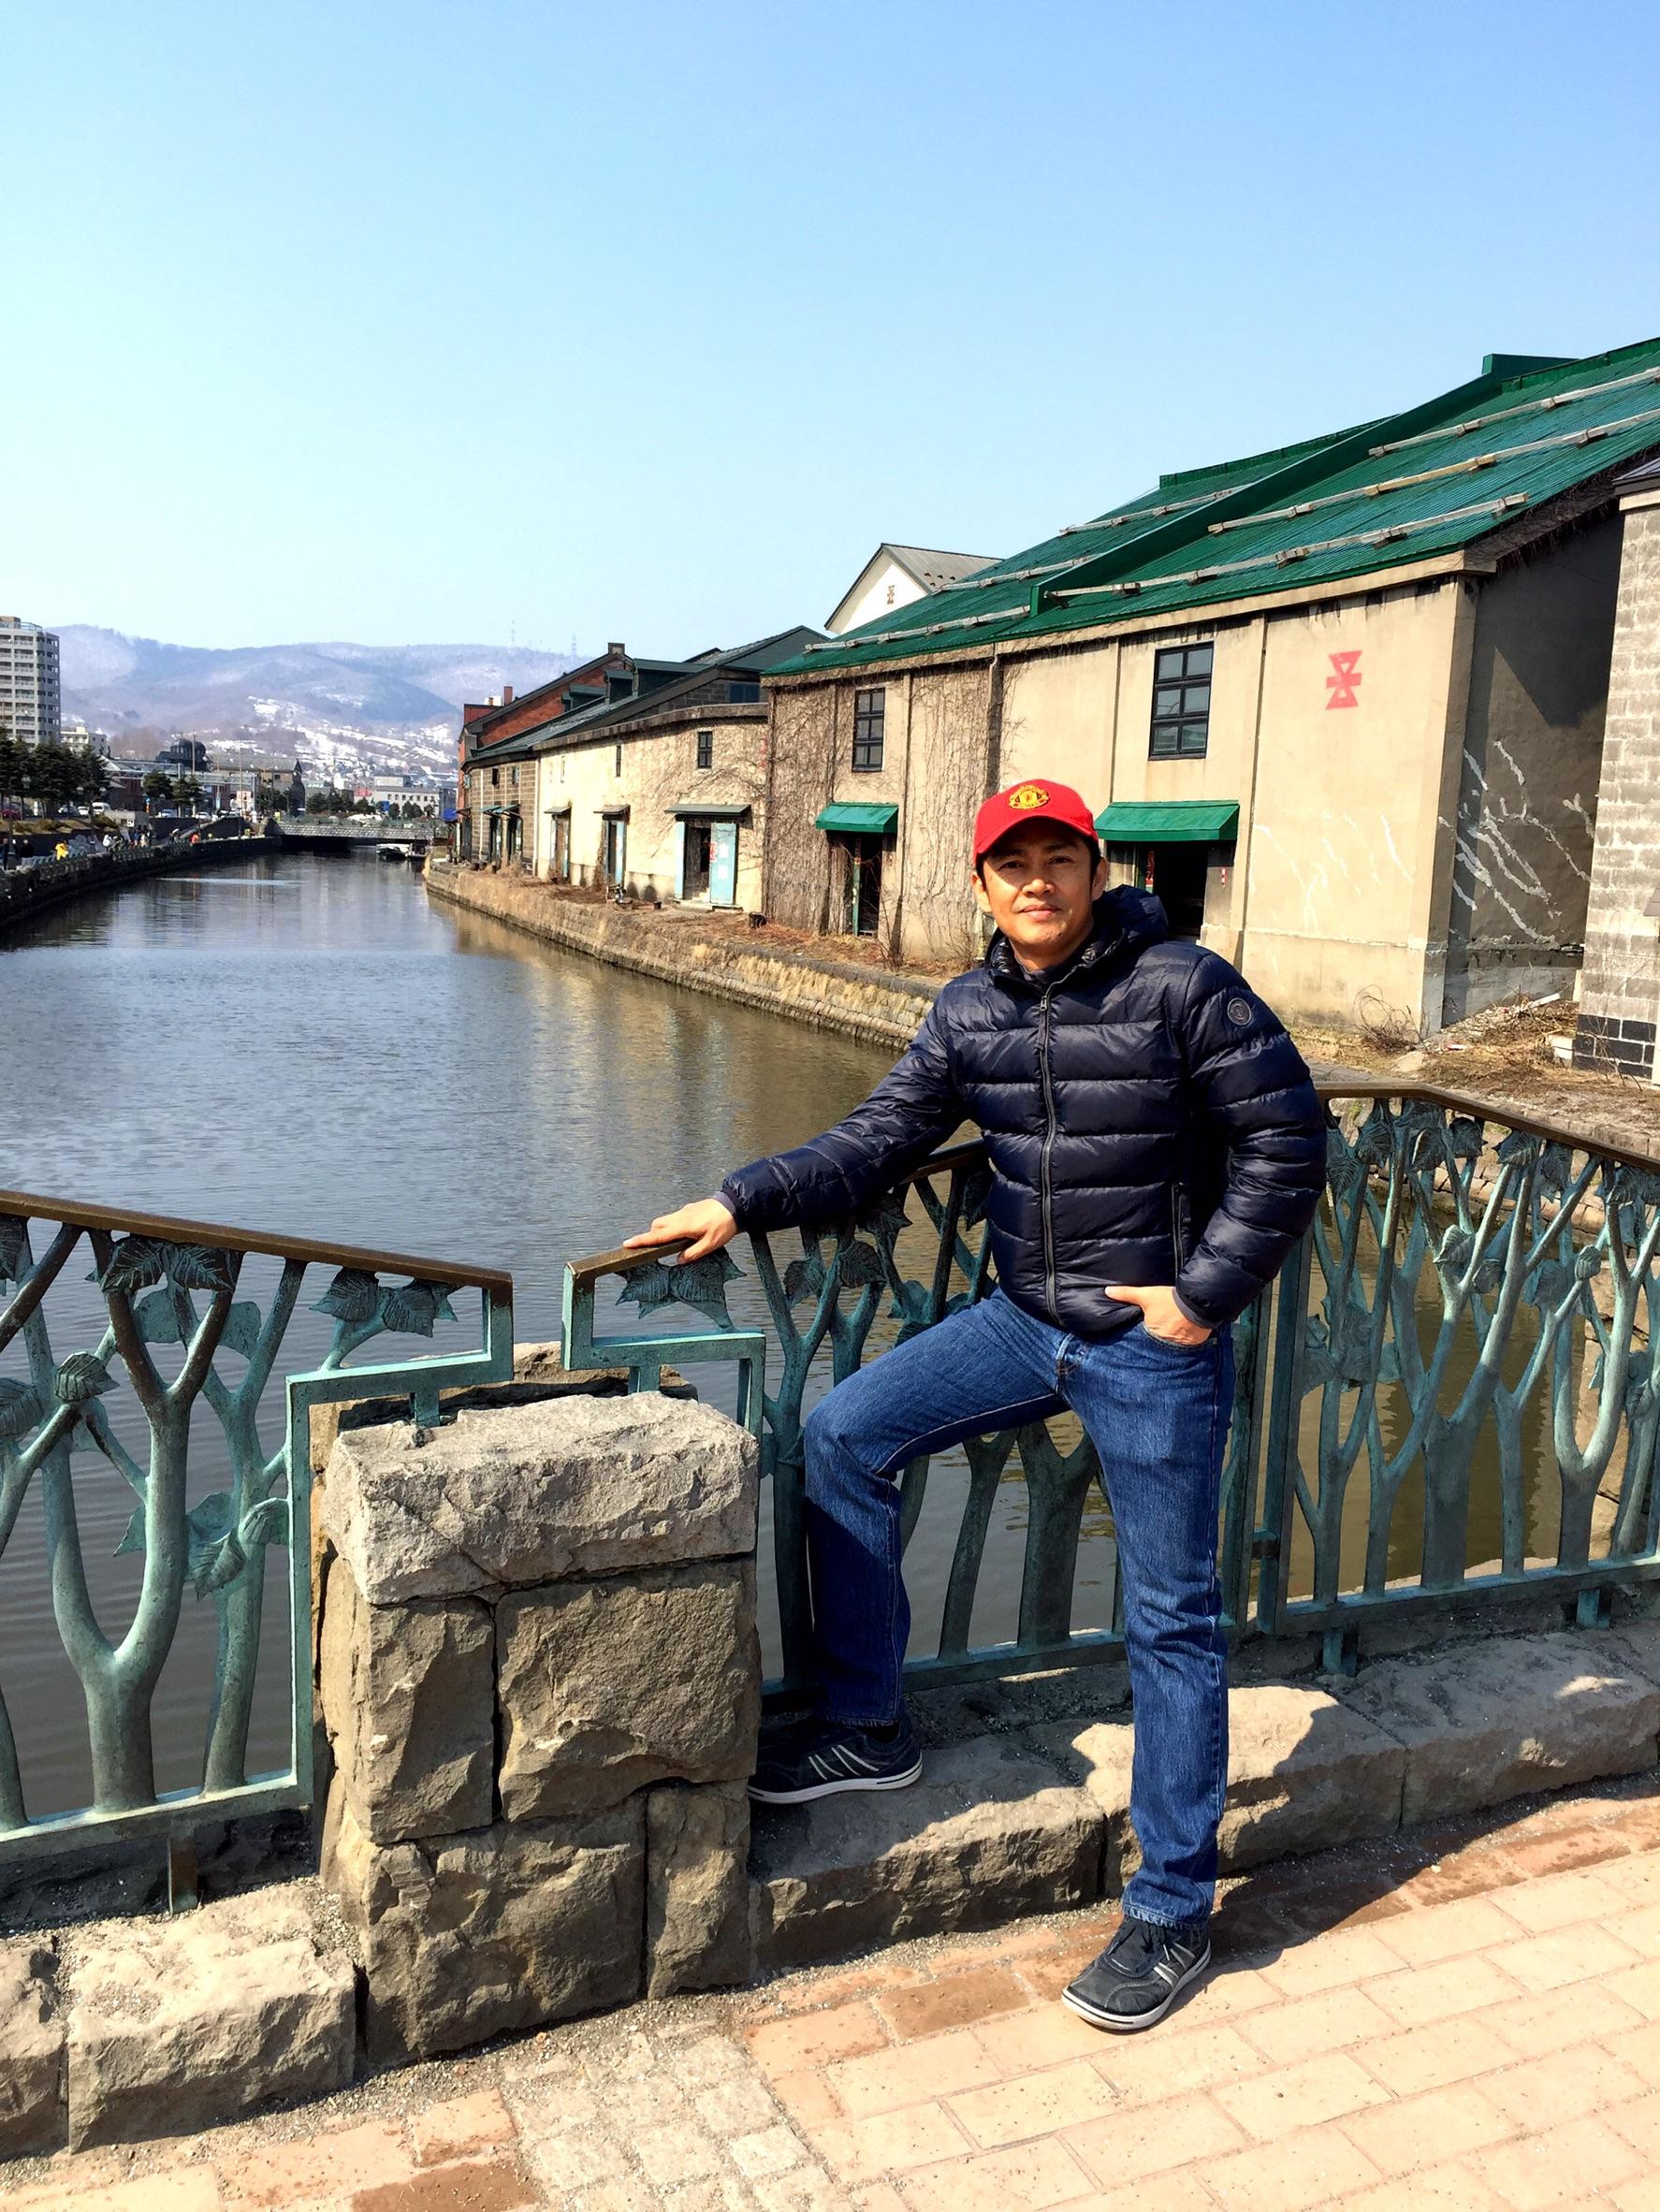 Chavanut Blog